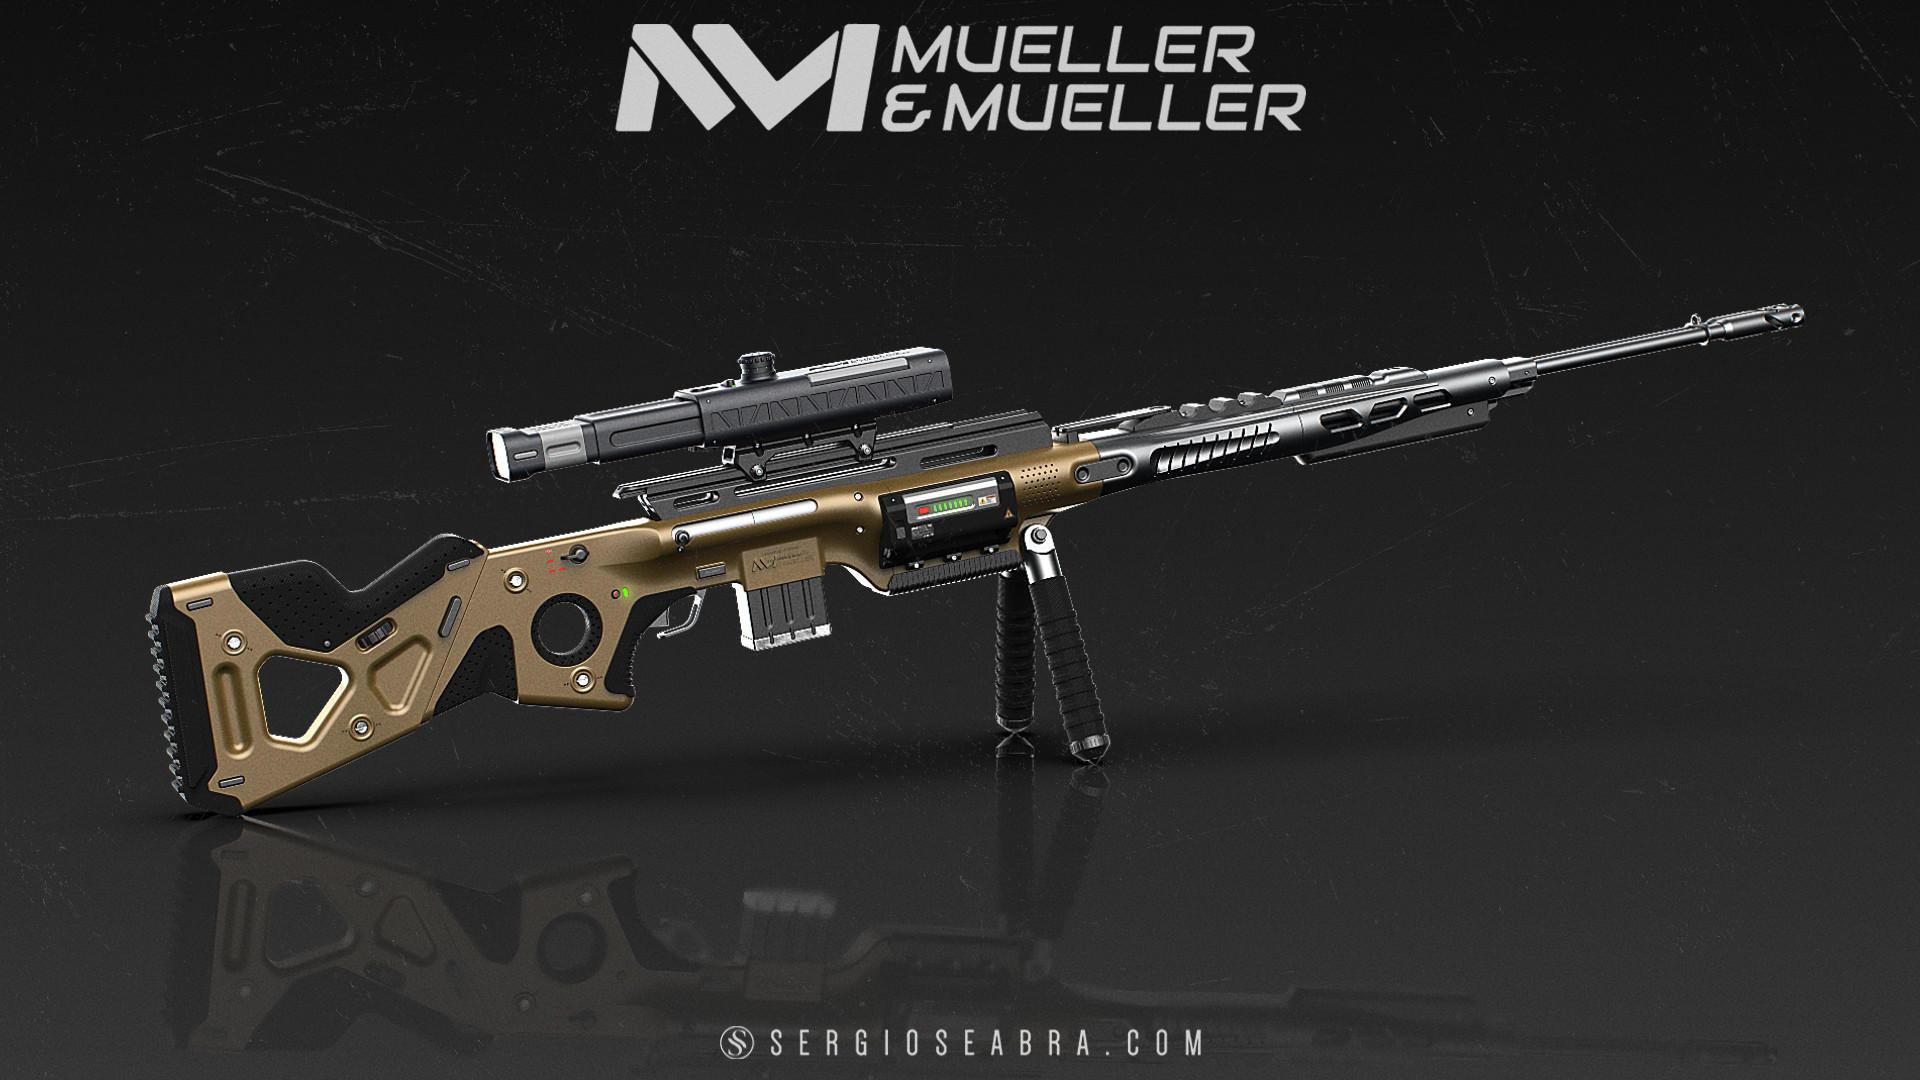 Sergio seabra 20180205 prop phantom twins sniper rifle layouts1